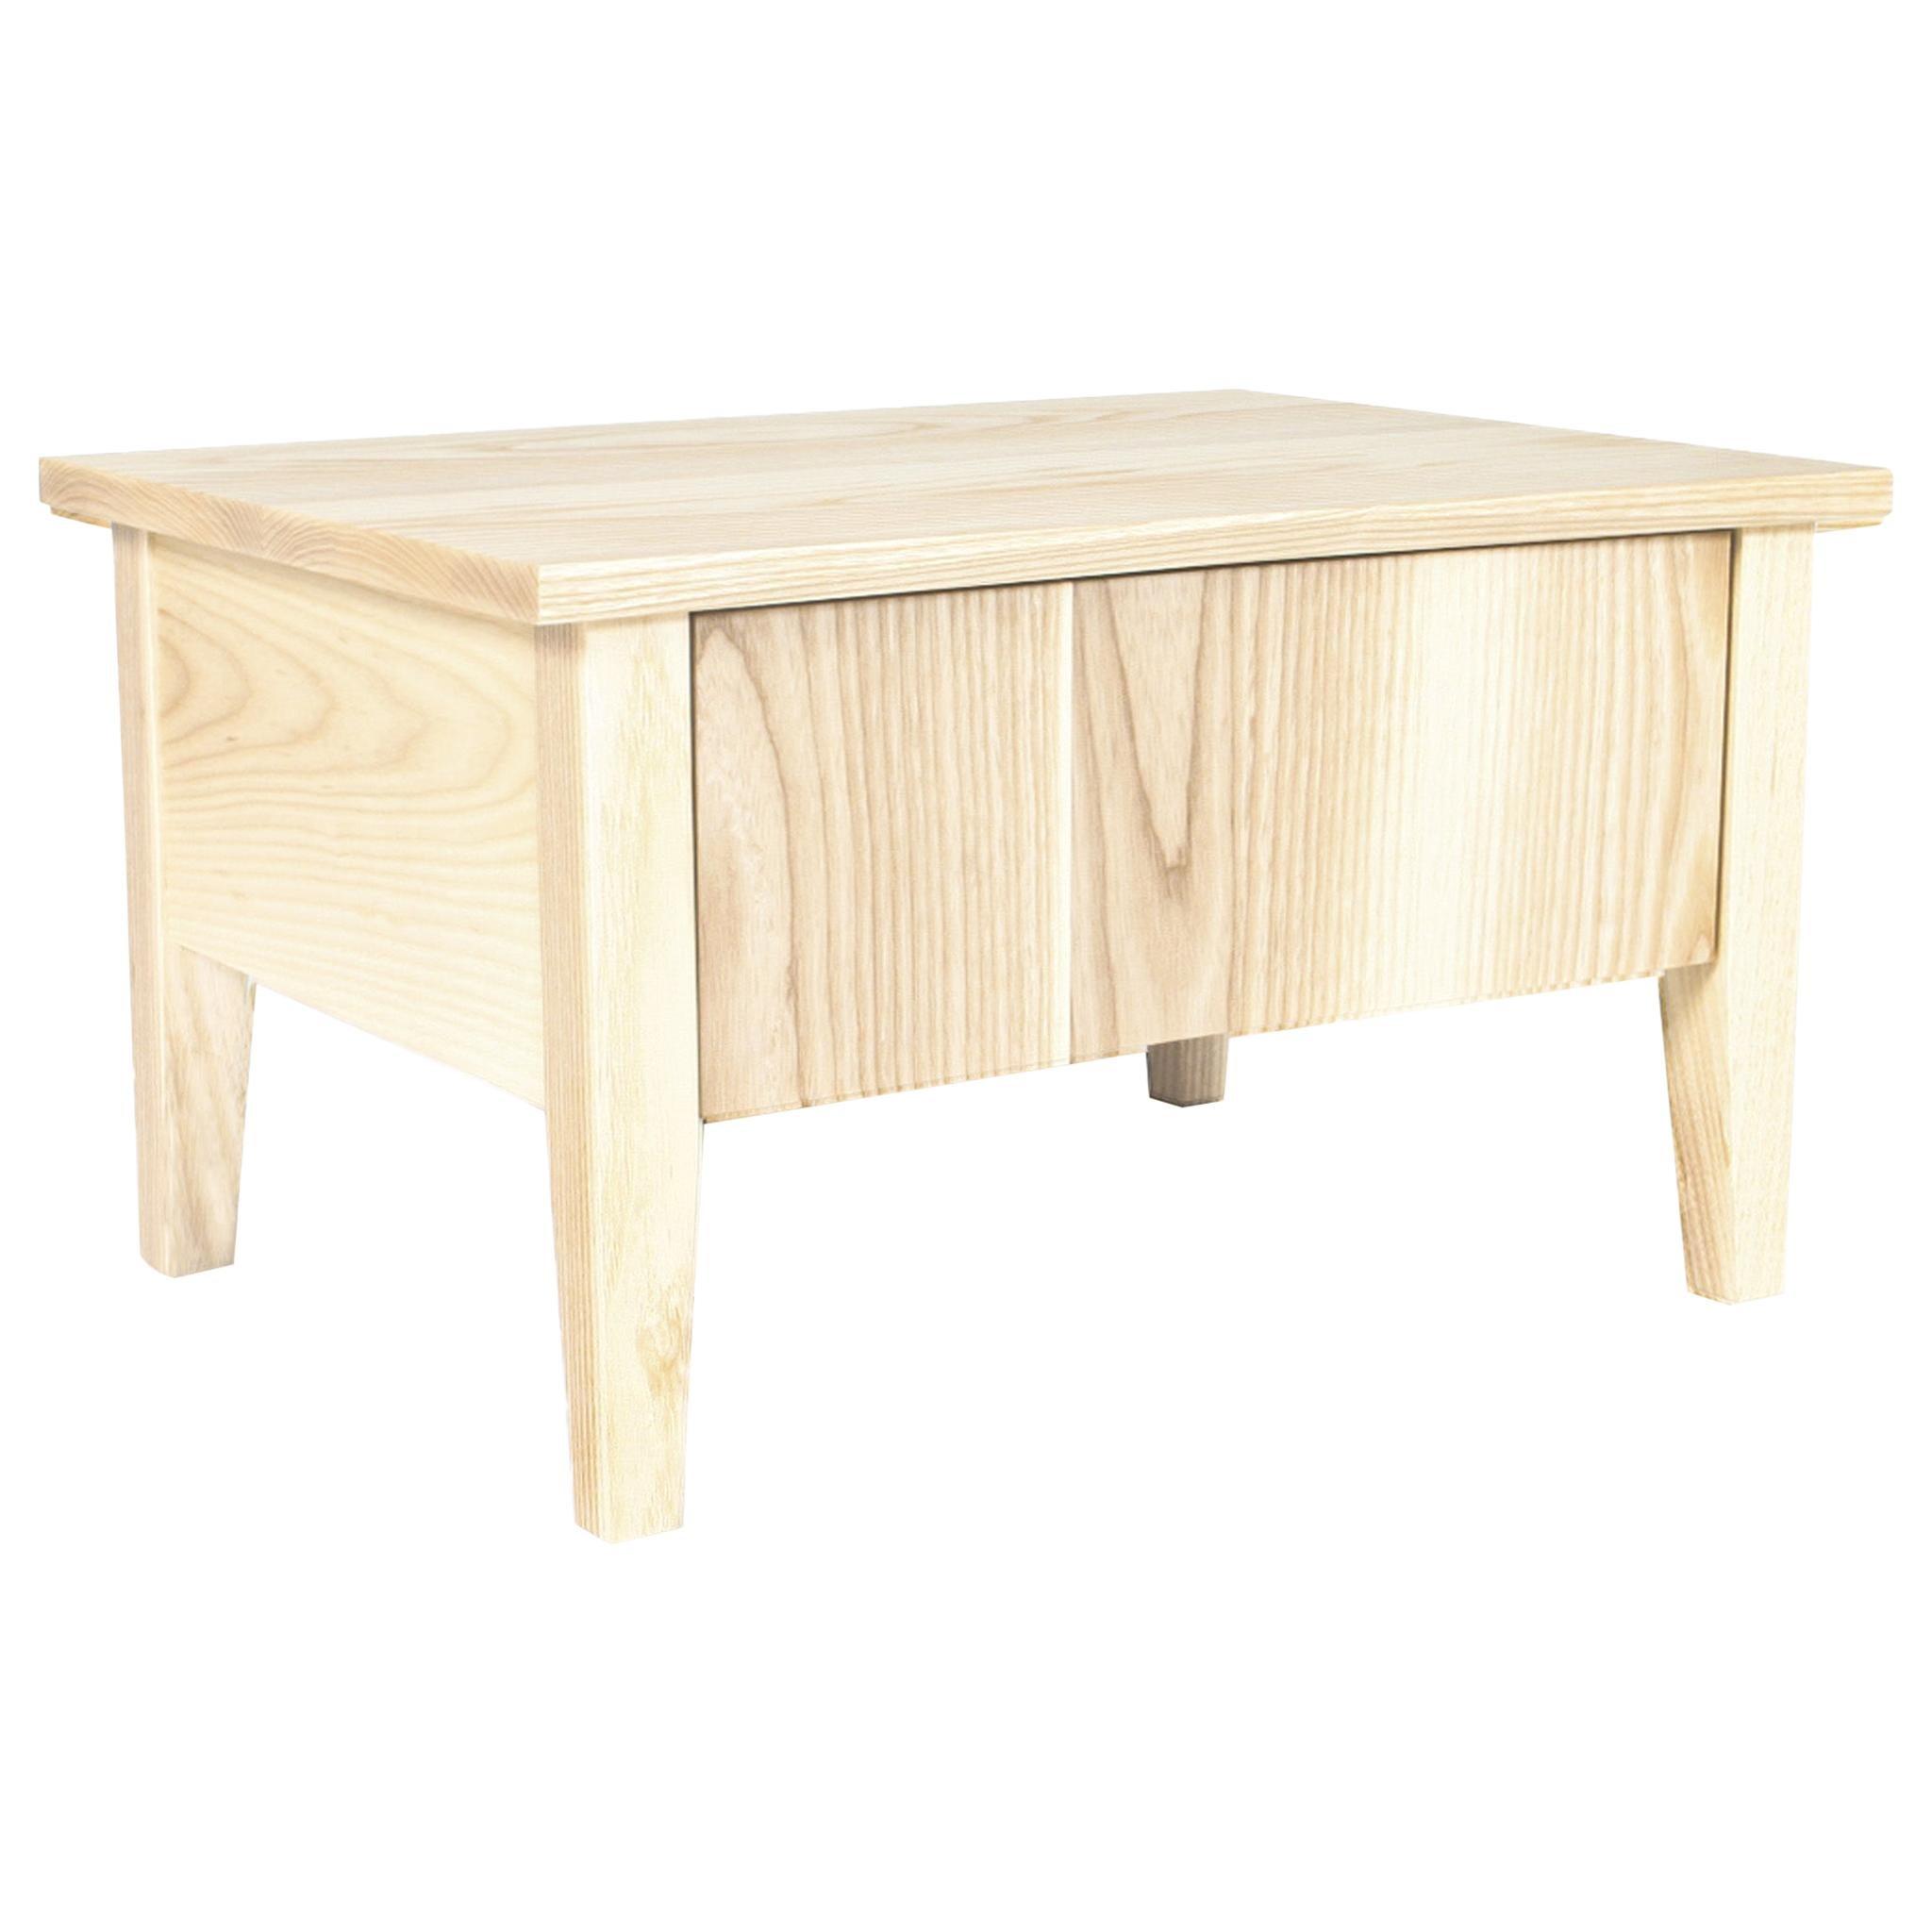 Bedside Table, Nightstand, Storage, White Ash, Custom, Hardwood, Semigood Design